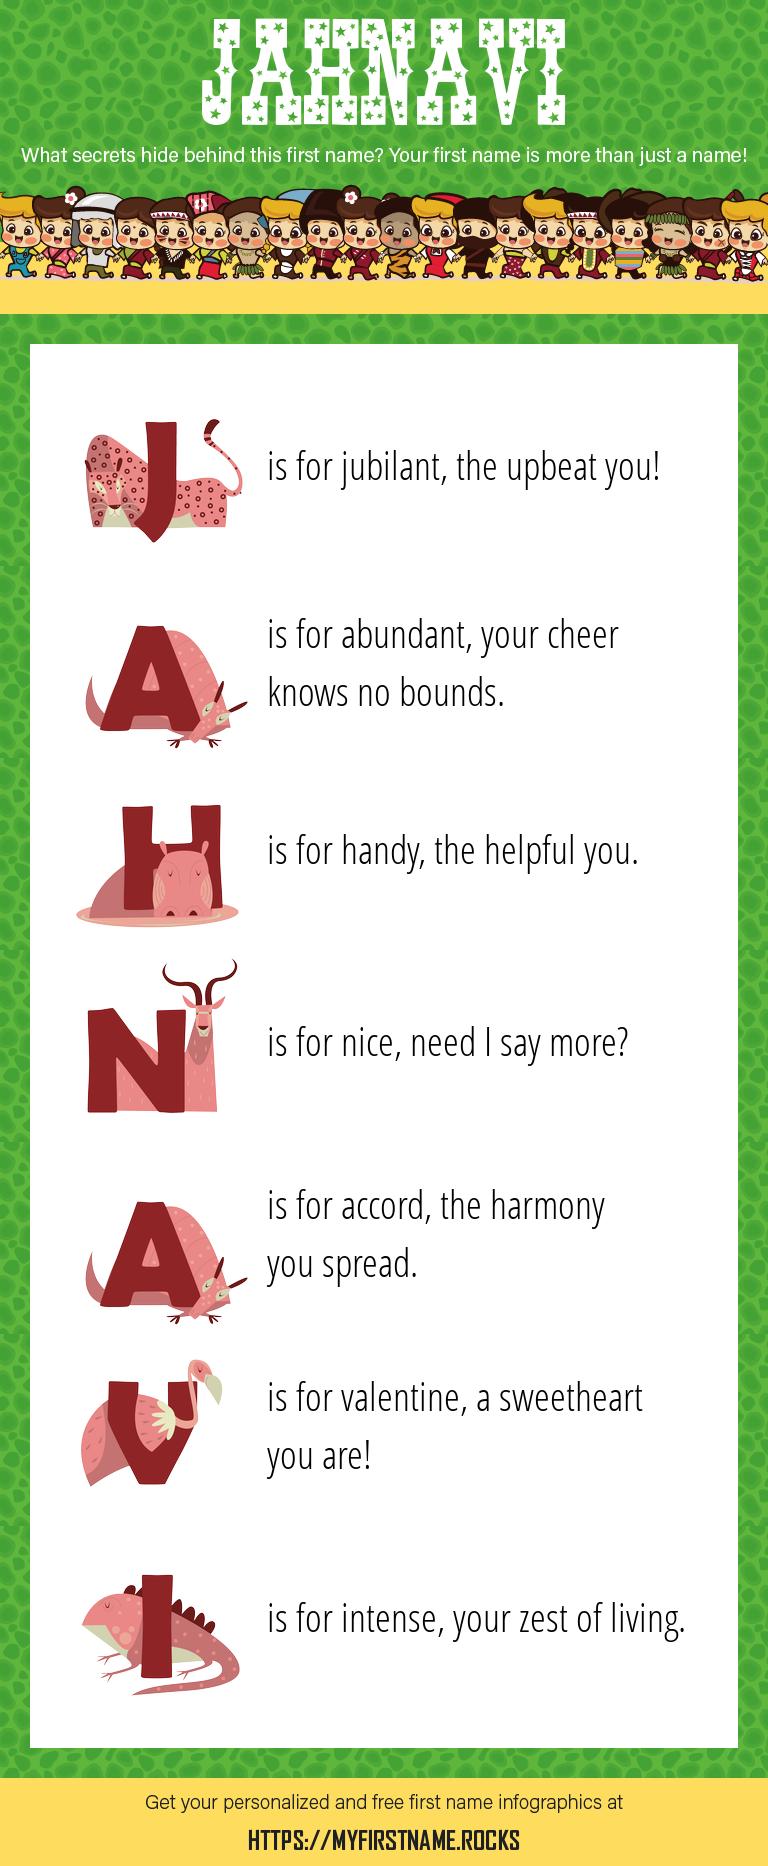 Jahnavi Infographics